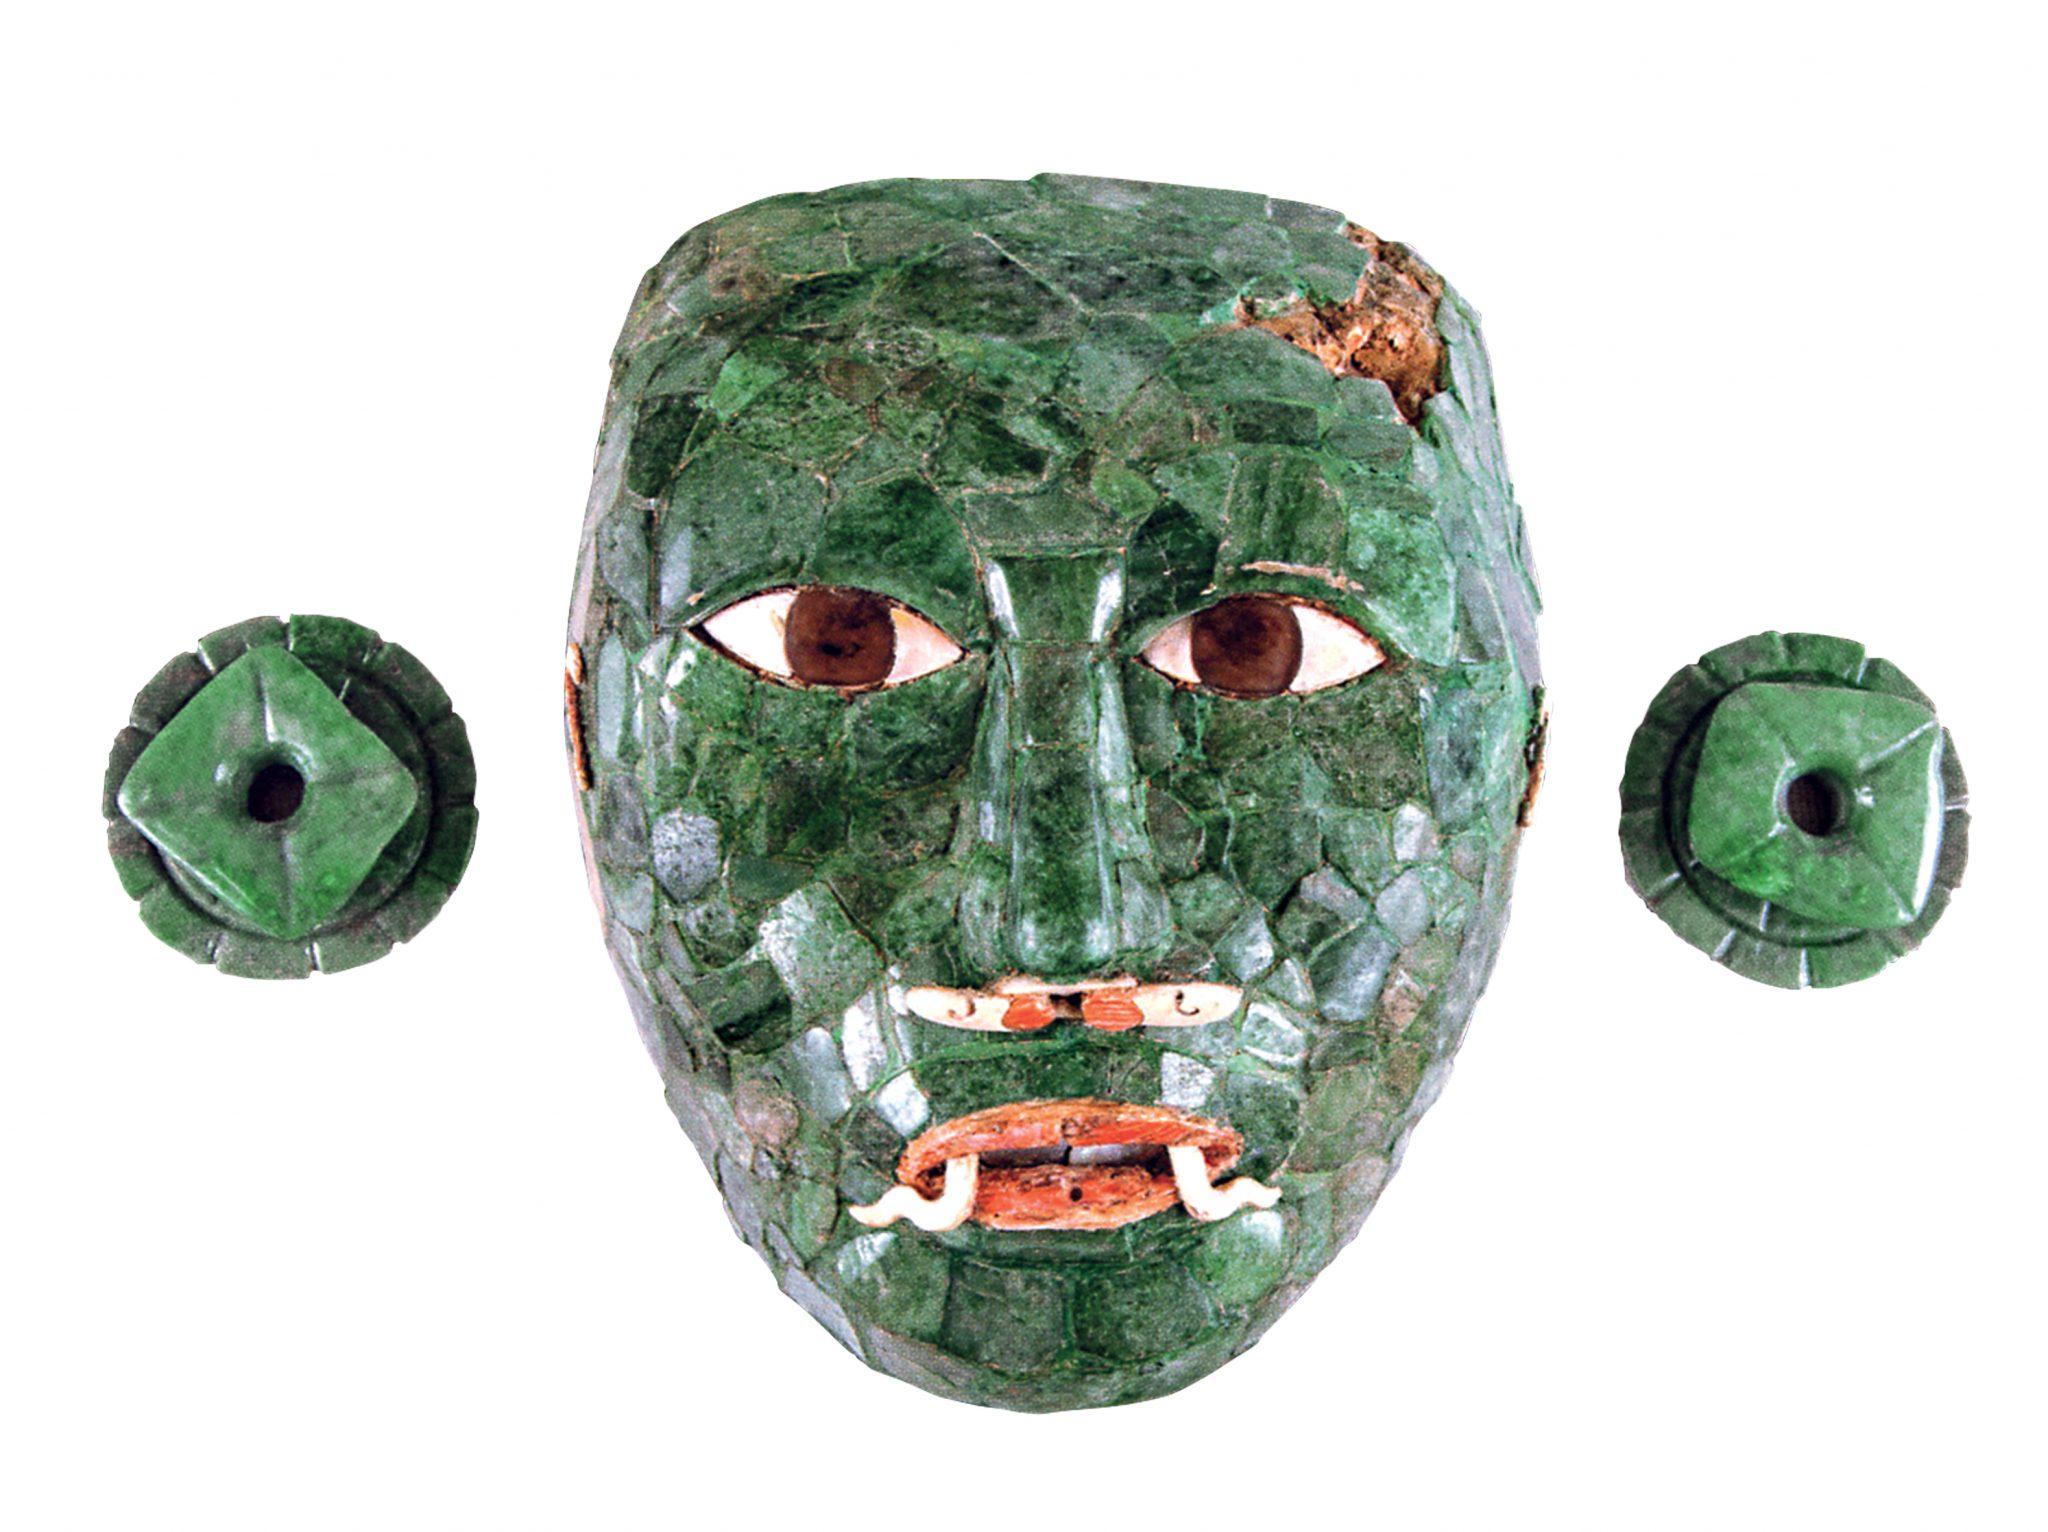 Maschera funeraria con ornamenti per le orecchie Calakmul, Campeche Periodo Classico Tardo (600 – 900 d.C.) Giada, ossidiana e conchiglia (Pinctada mazatlánica e Spondylus princeps) INAH. Museo Arqueológico de Campeche, Fuerte de San Miguel. San Francisco de Campeche, Campeche